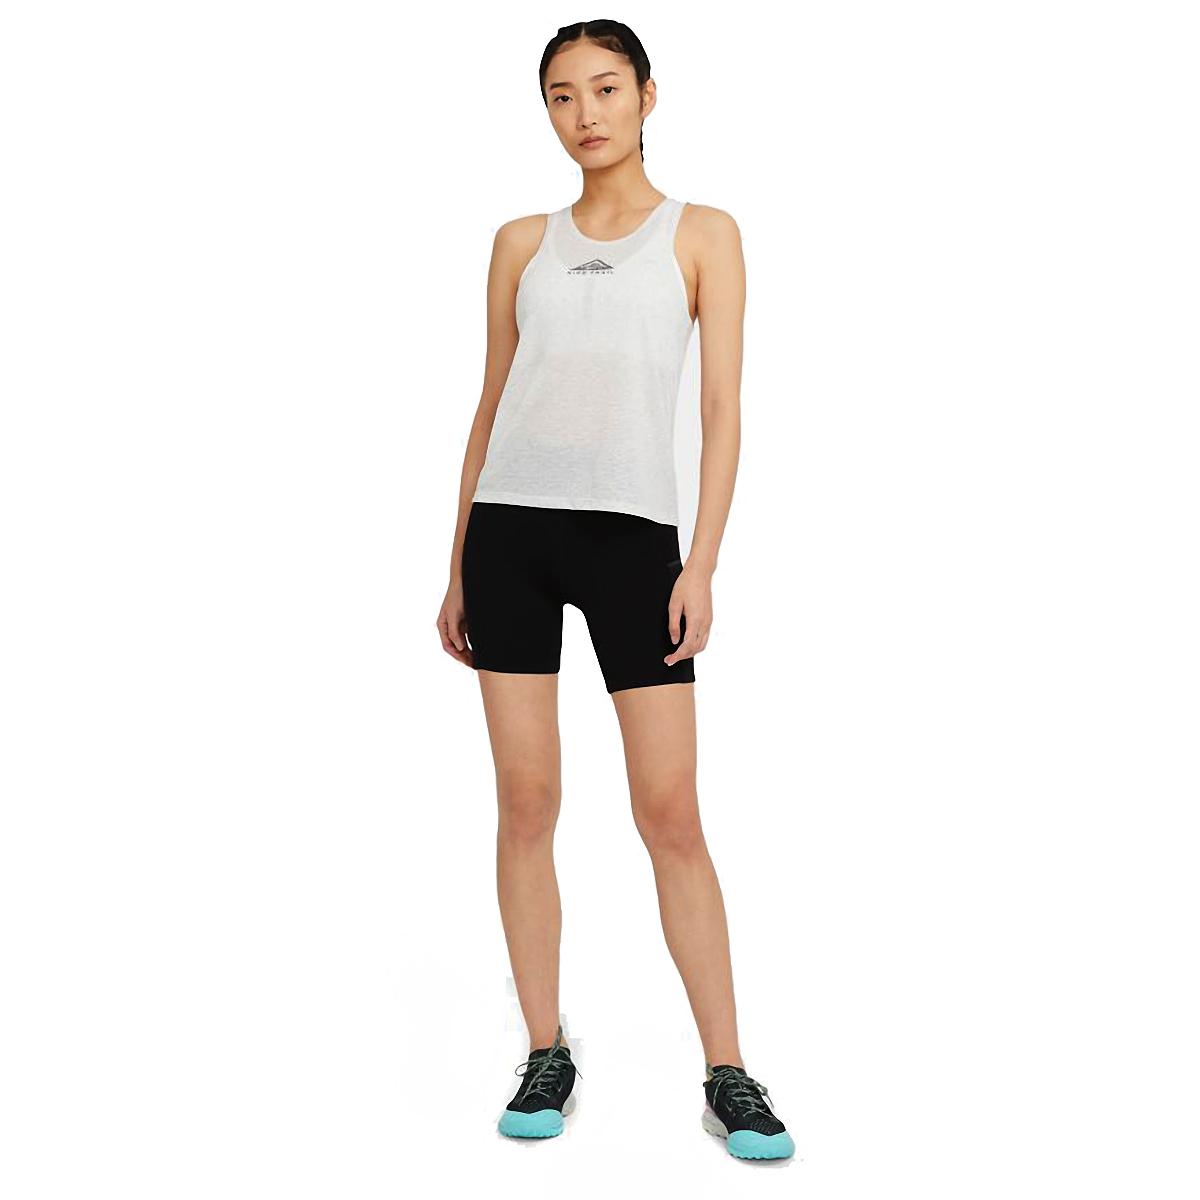 Women's Nike City Sleek Trail Running Tank - Color: Light Smoke Grey/Grey Fog/Reflective Silver - Size: XS, Light Smoke Grey/Grey Fog/Reflective Silver, large, image 3